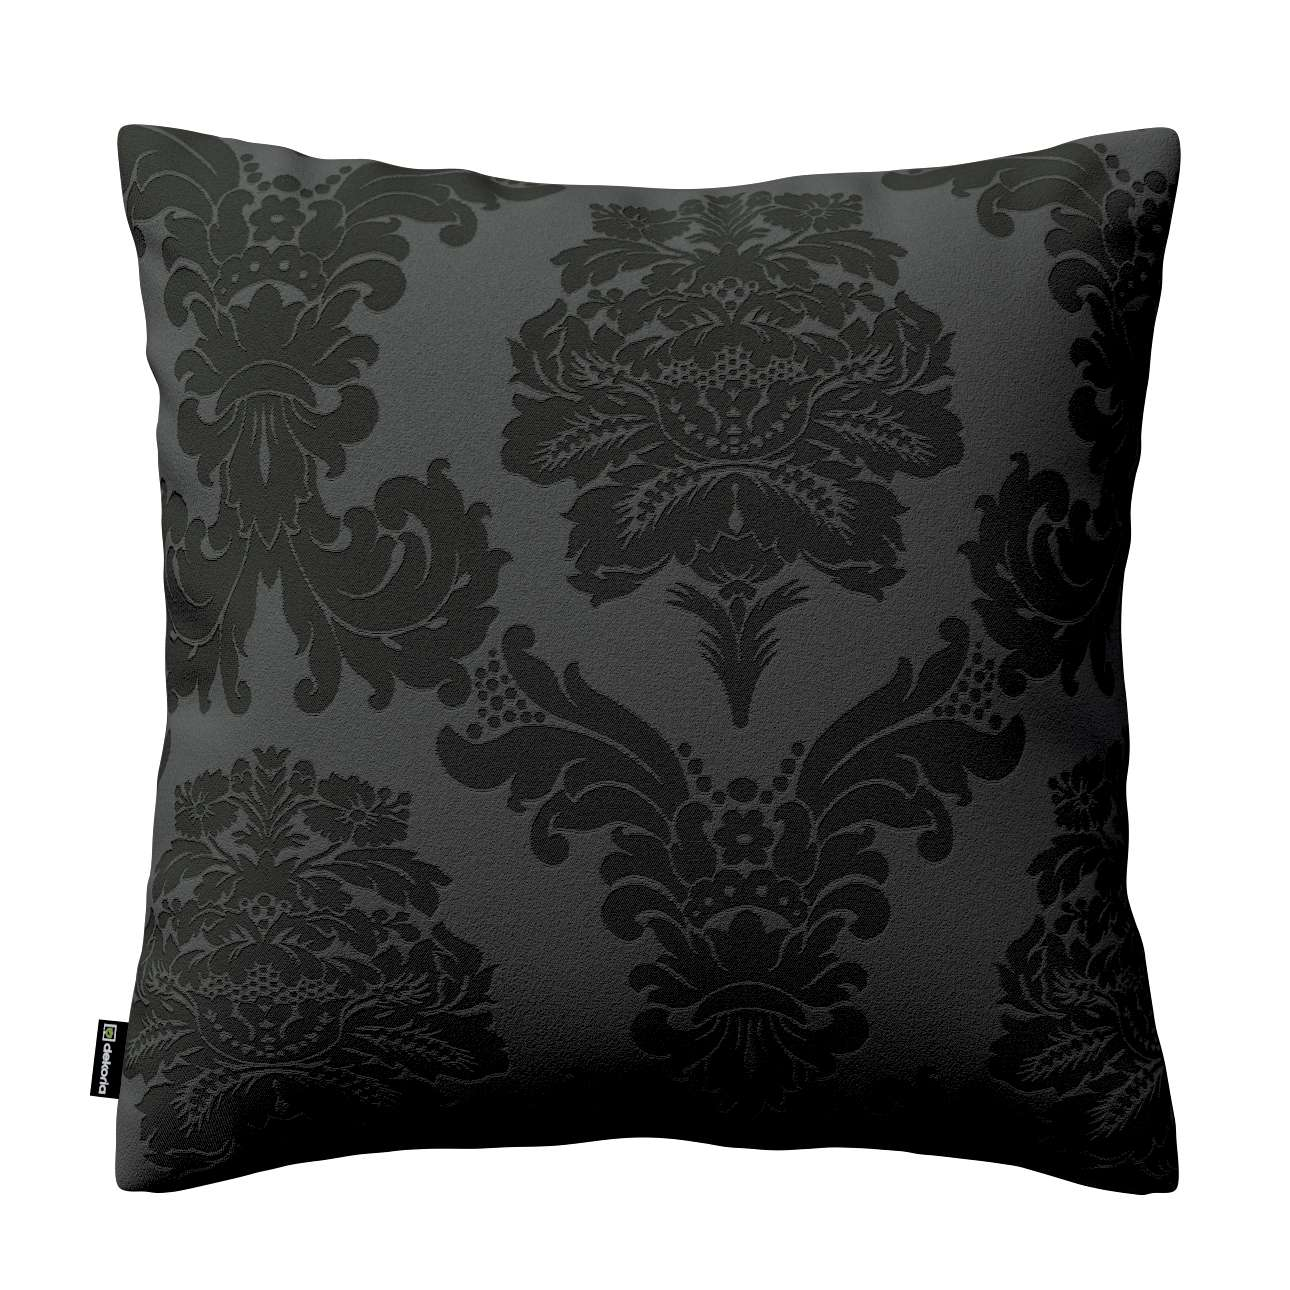 Karin - jednoduchá obliečka V kolekcii Damasco, tkanina: 613-32